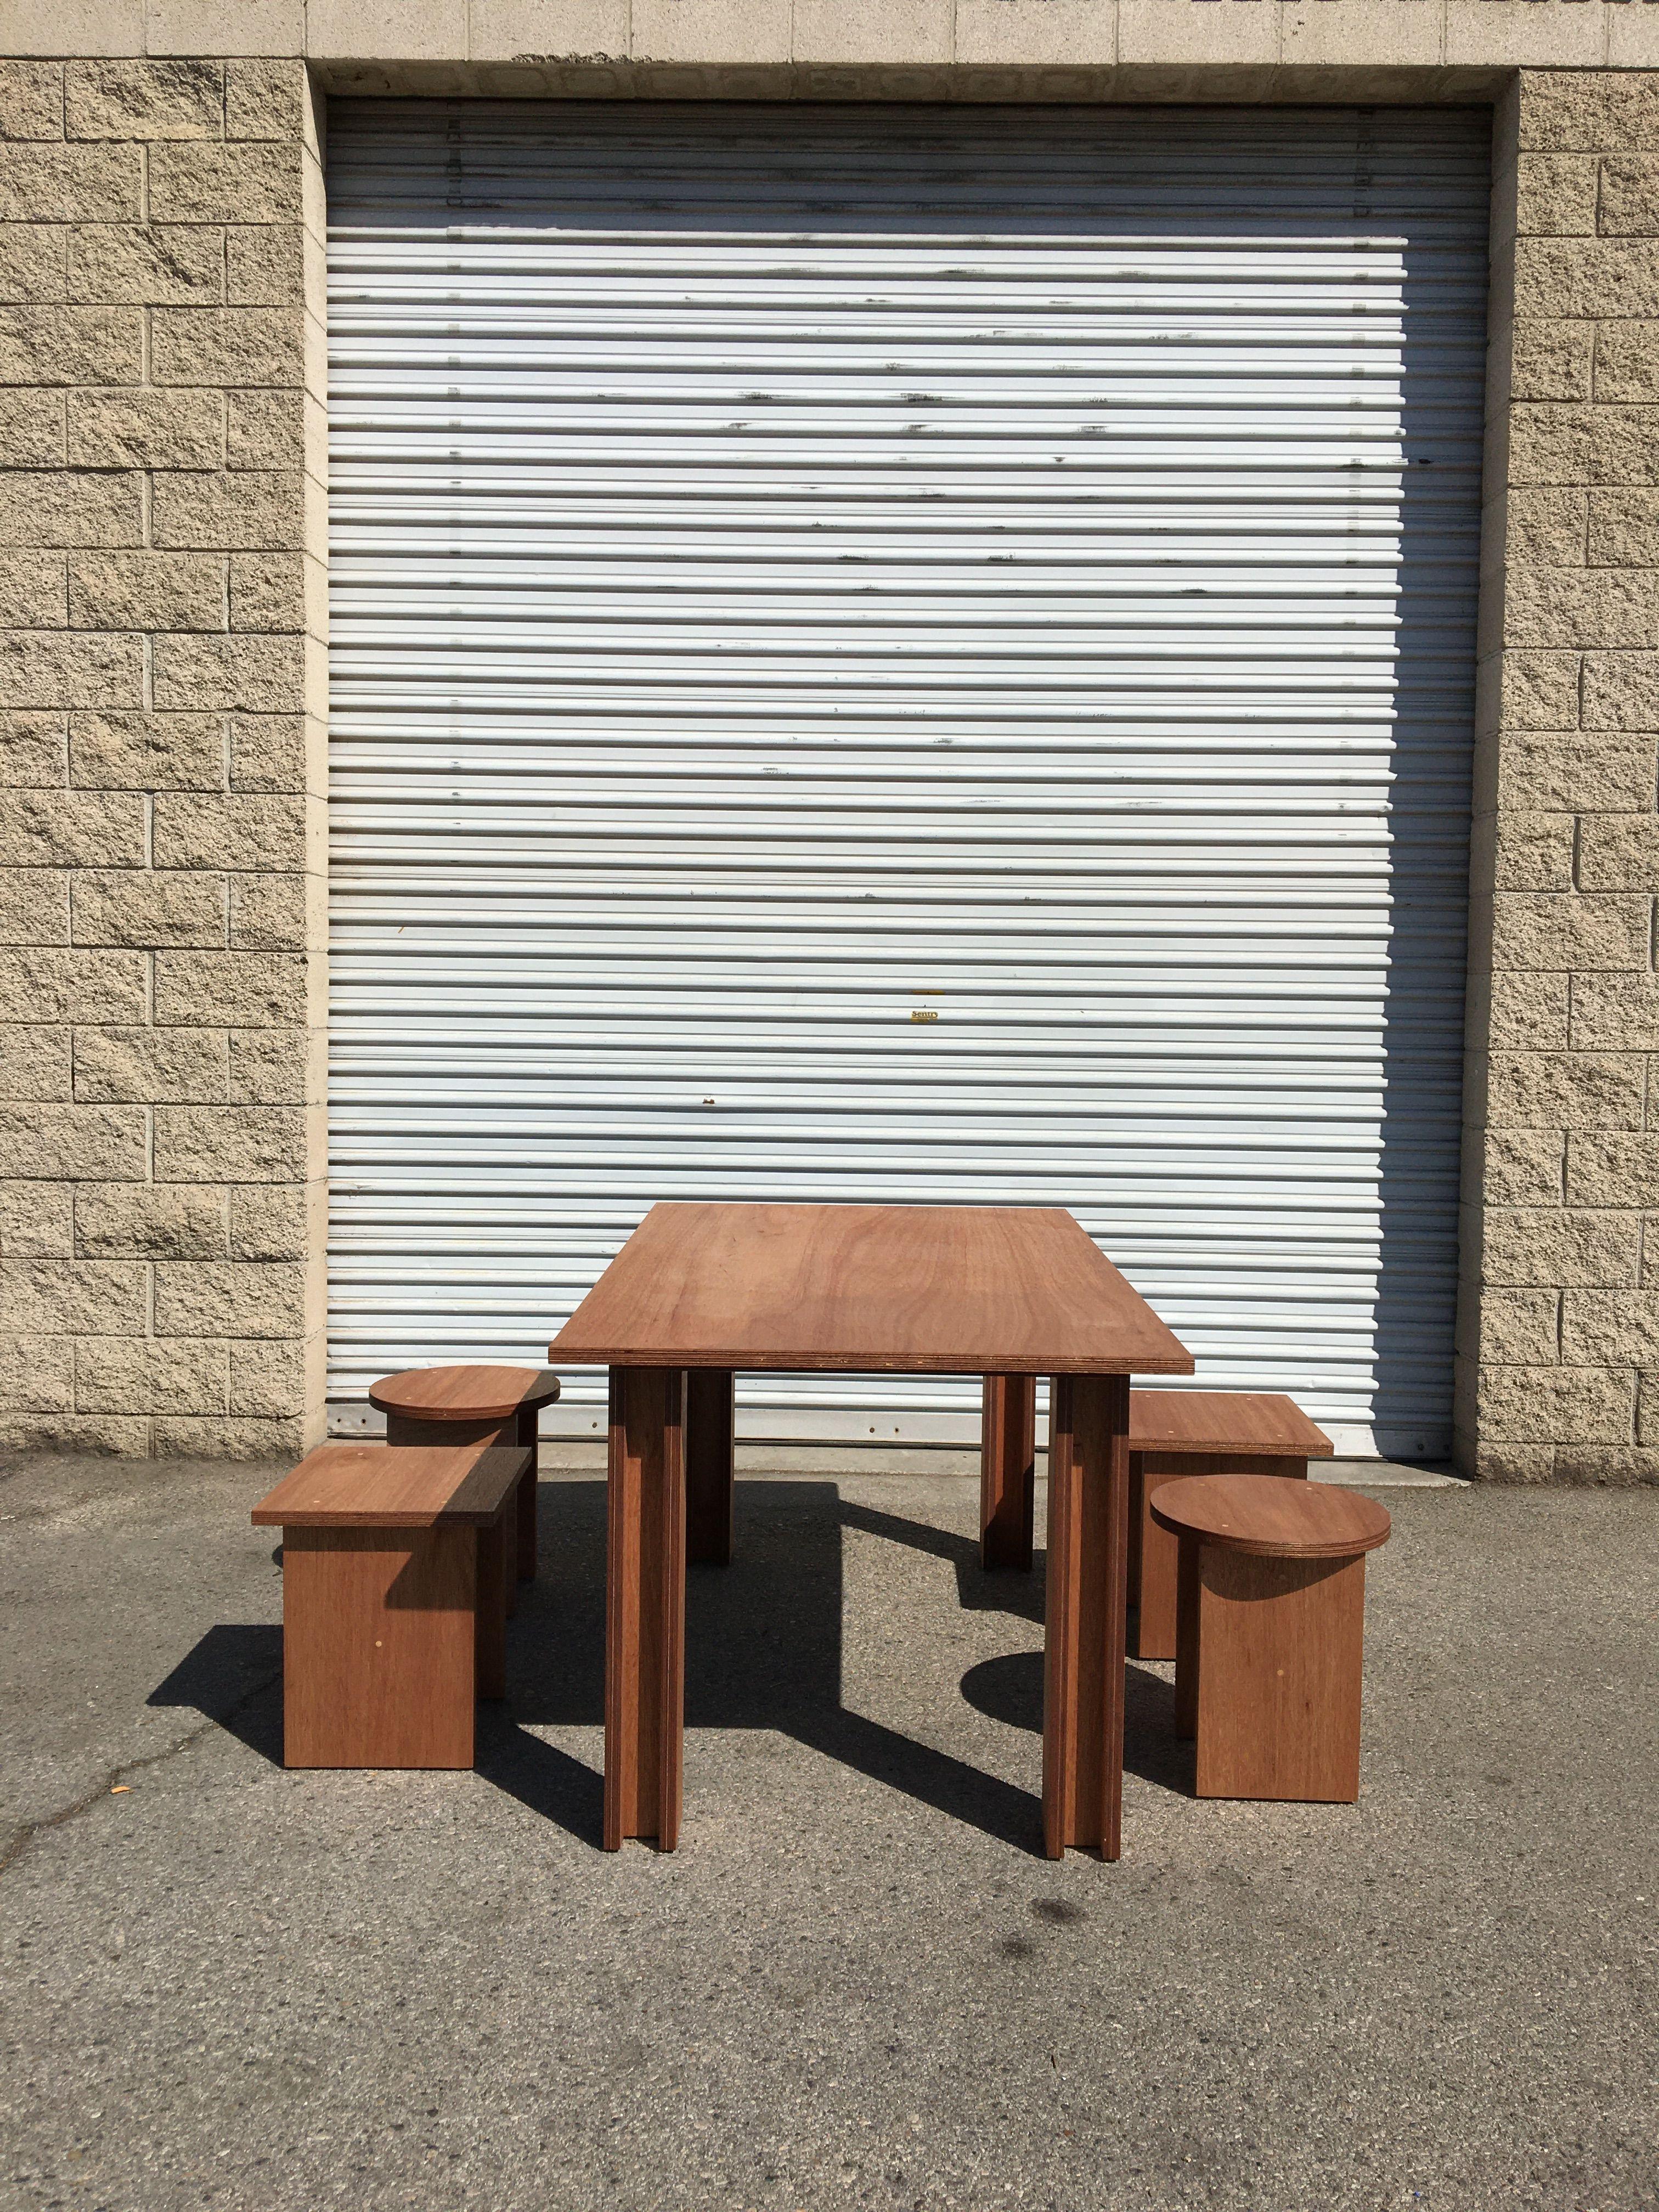 Outdoor I-Beam Set product image 1